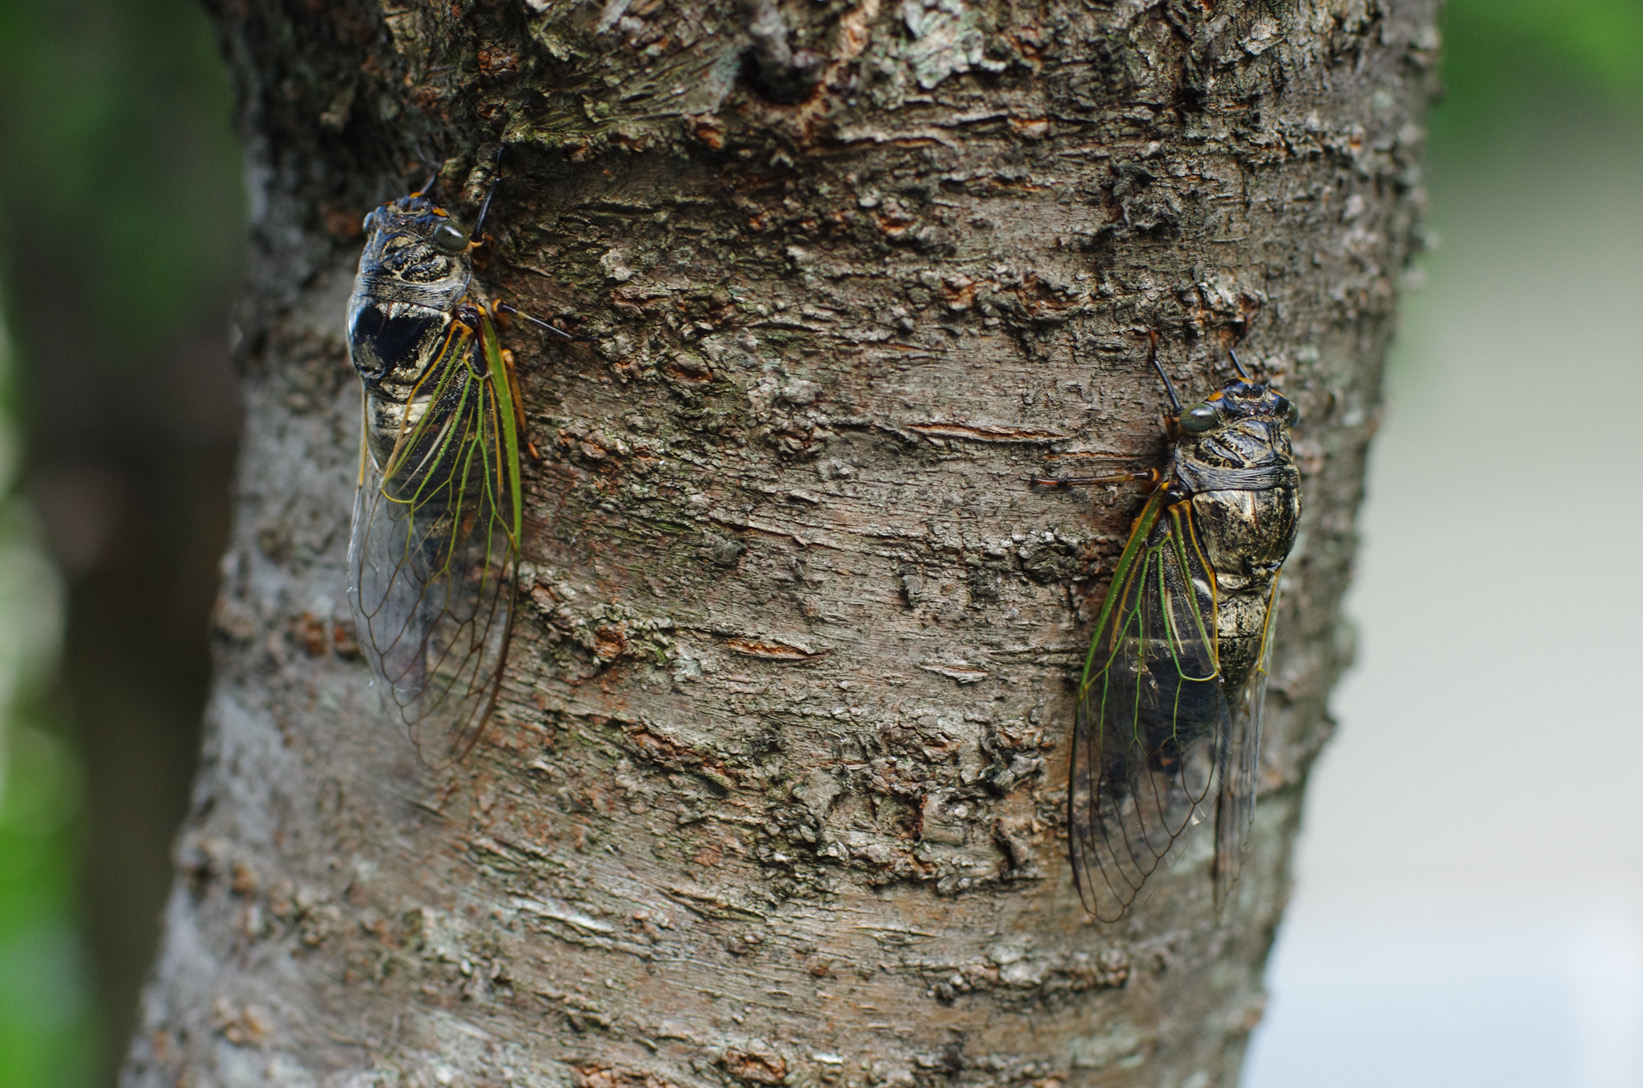 Cigales Kumazemi, Cryptotympana facialis à Nara au Japon en août 2014. Chant de l'espèce : shaaa-shaaa...